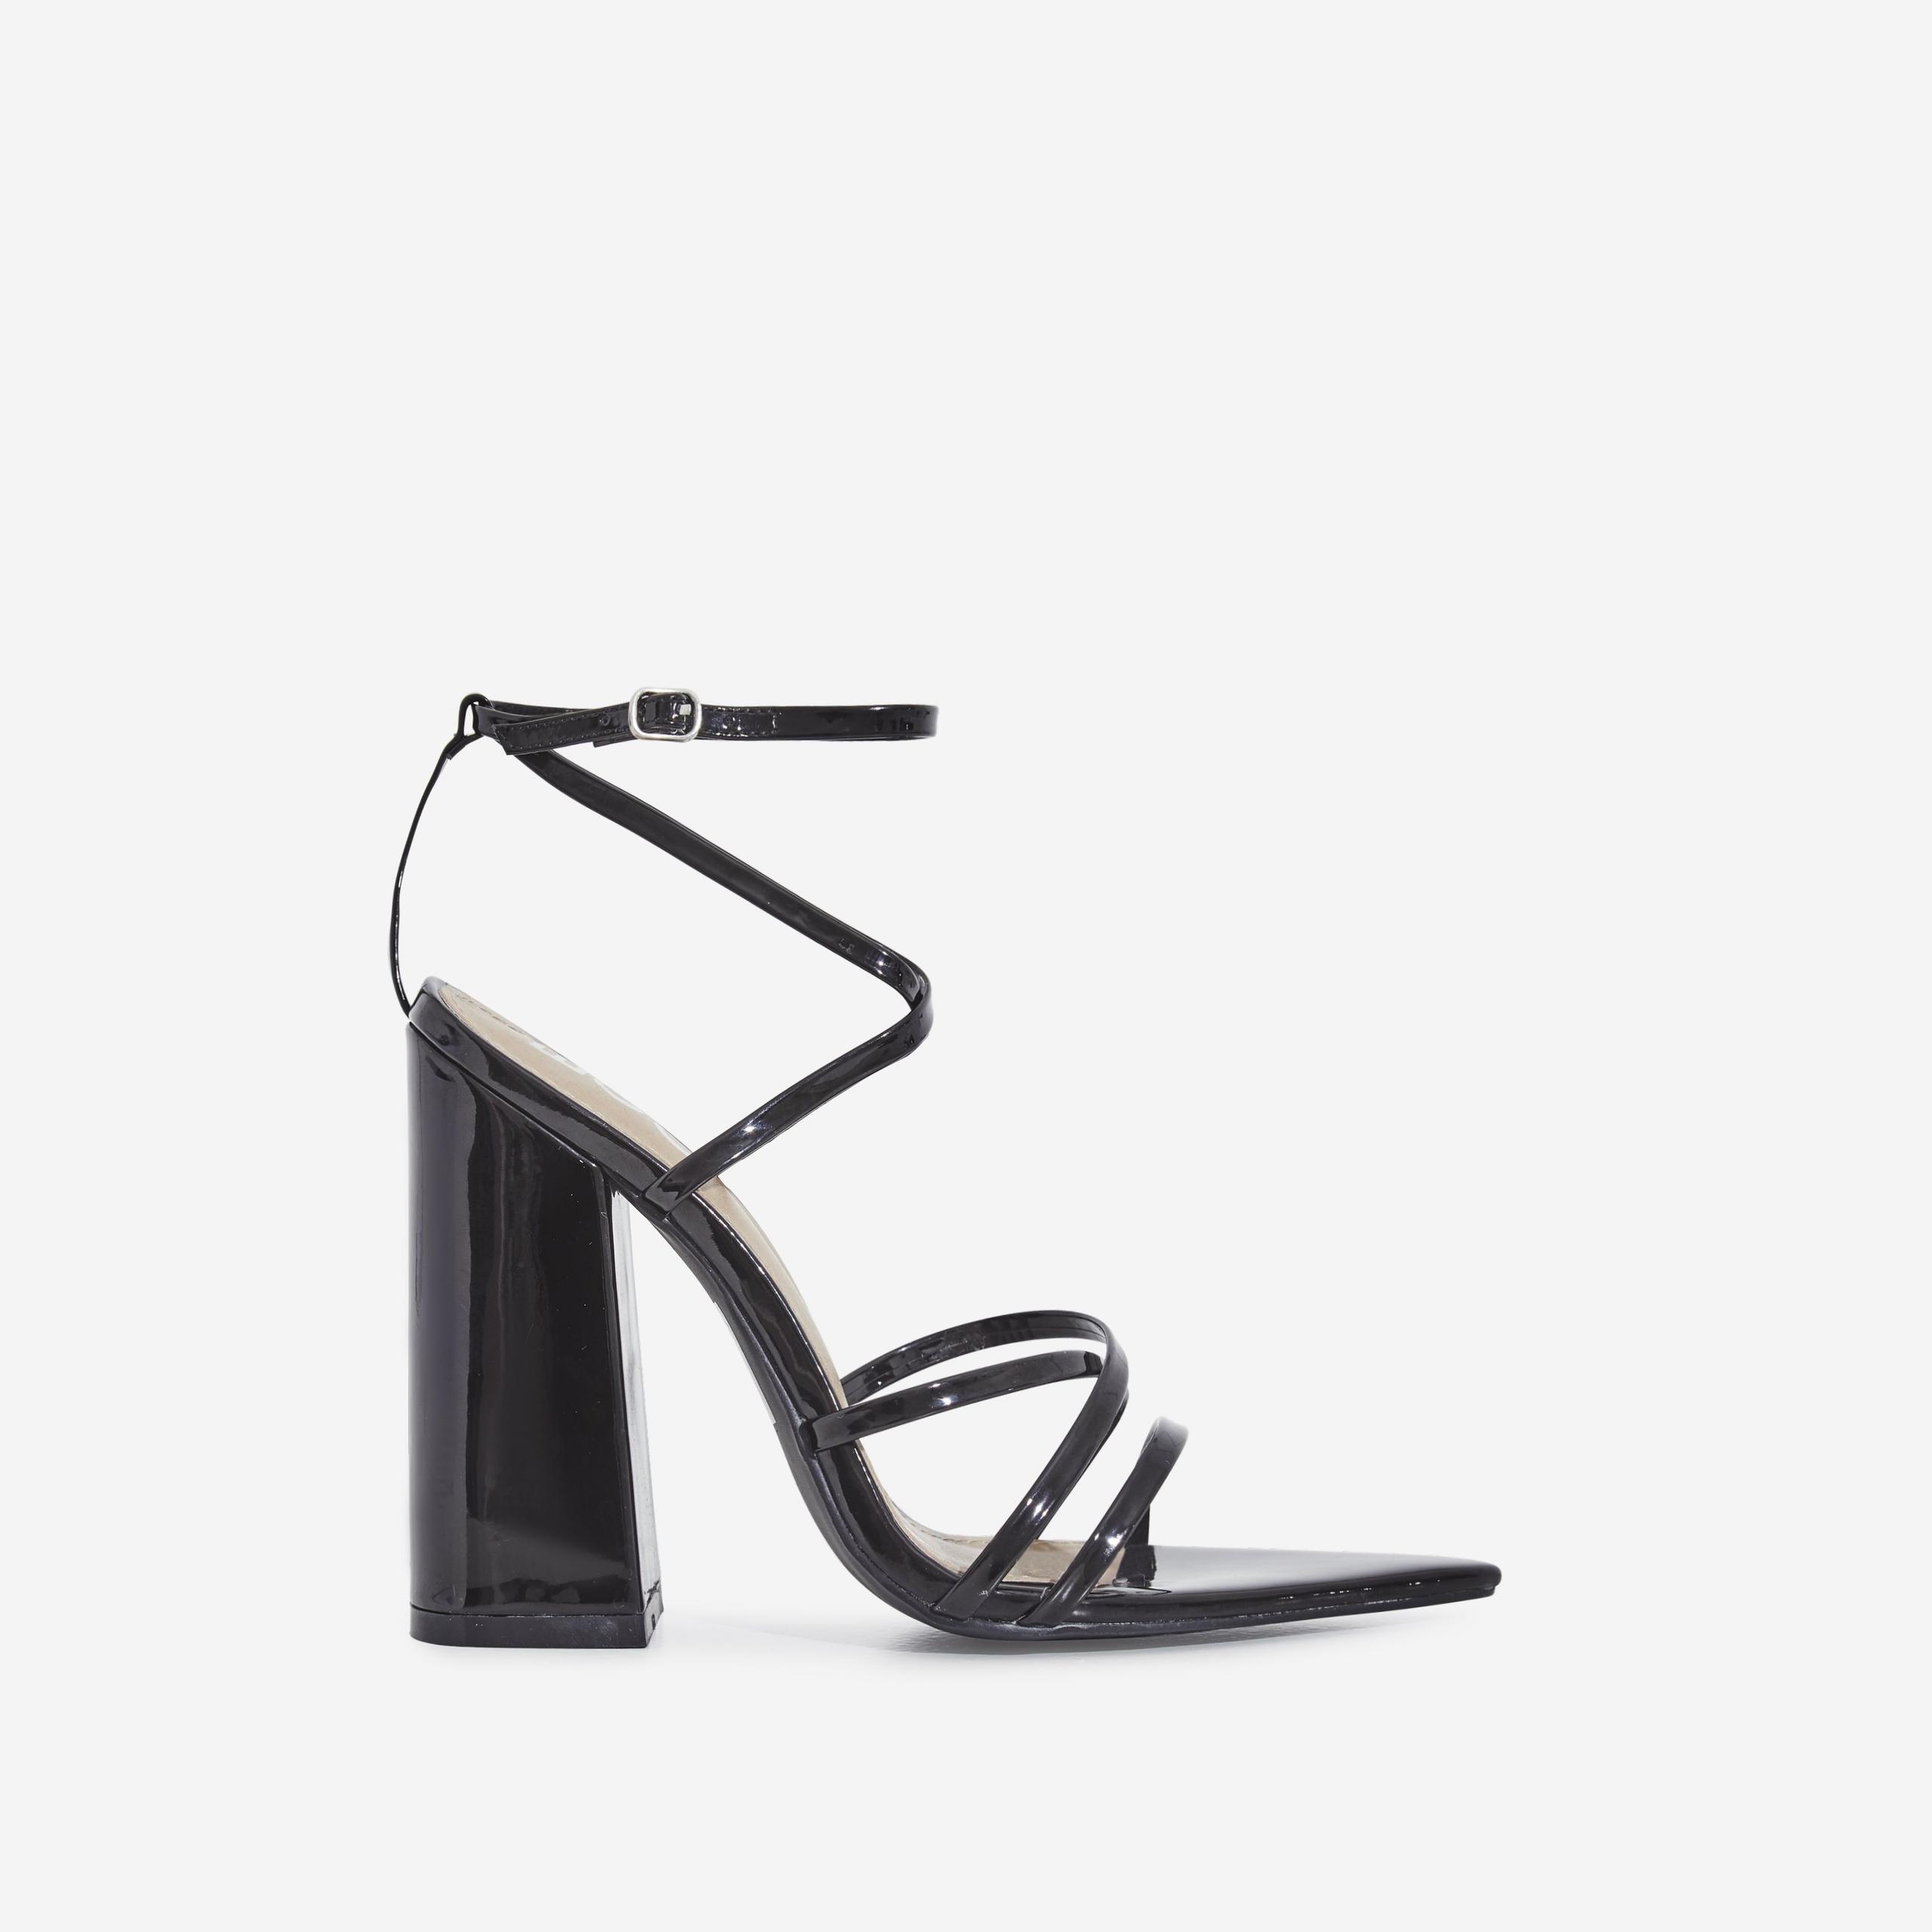 Halo Pointed Toe Block Heel In Black